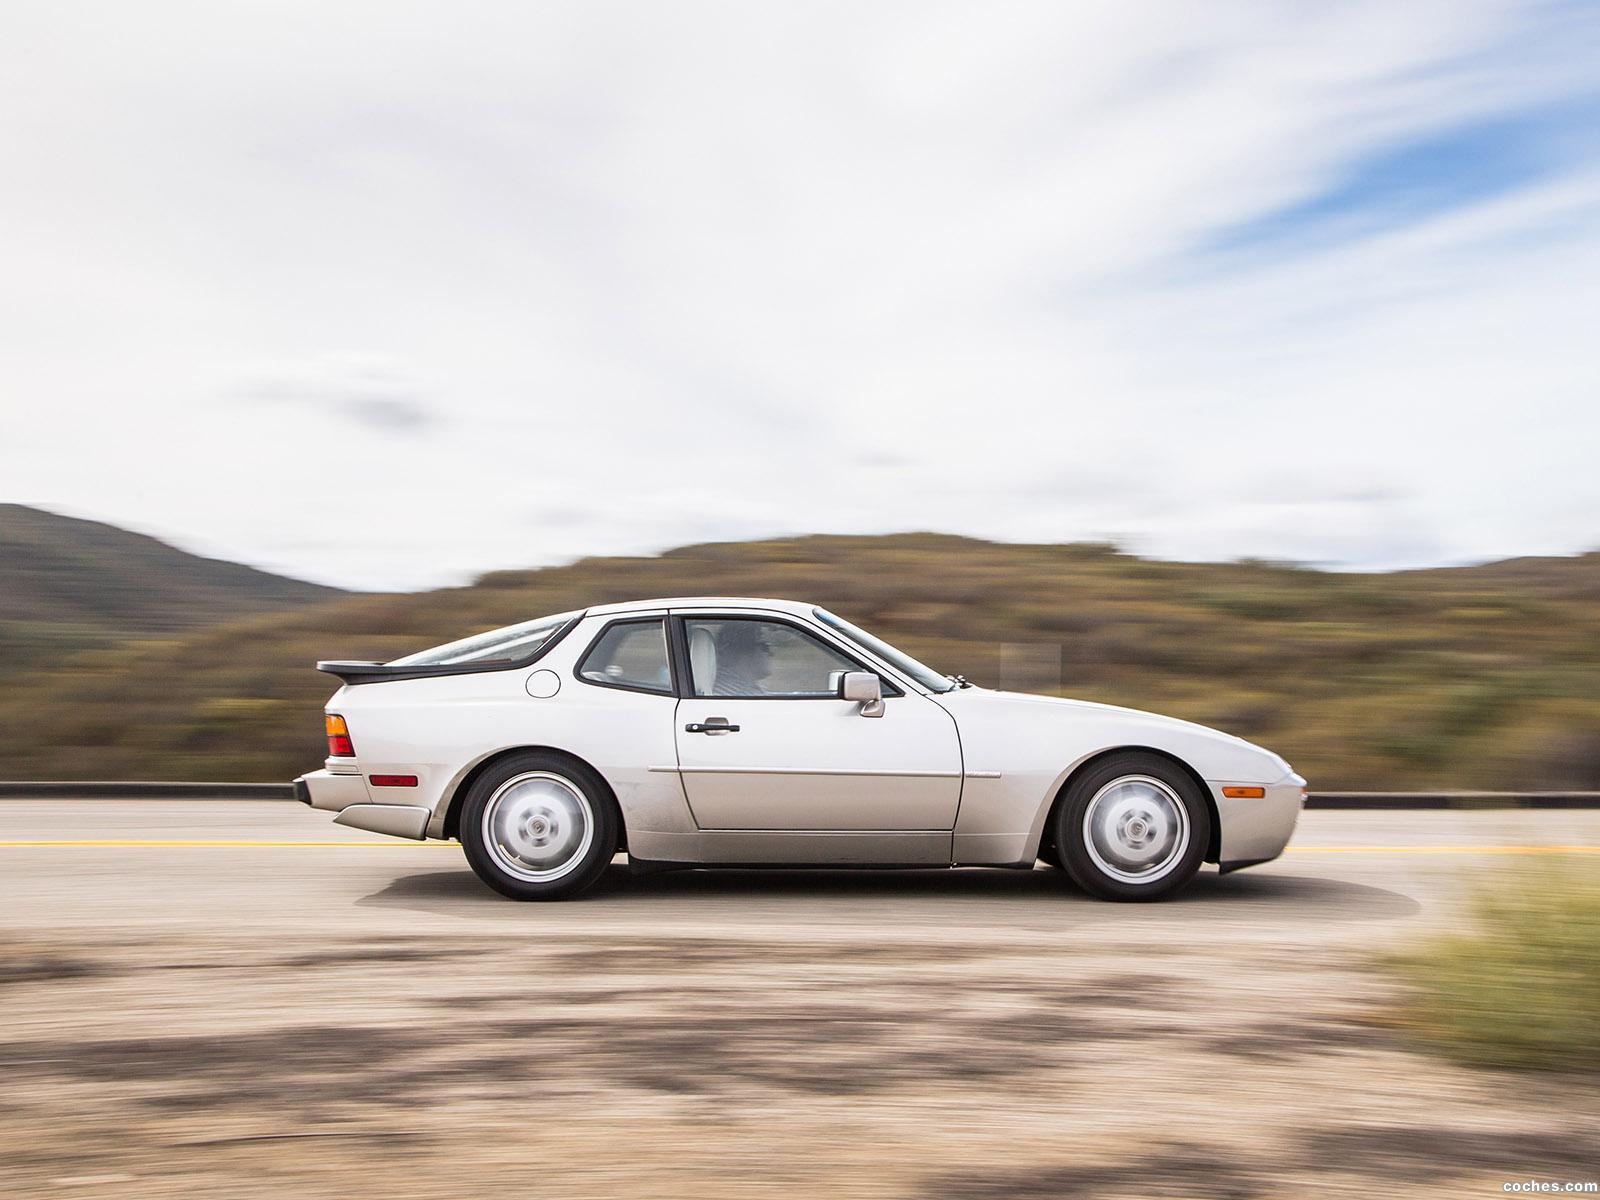 Foto 11 de Porsche 944 S2 USA 1989